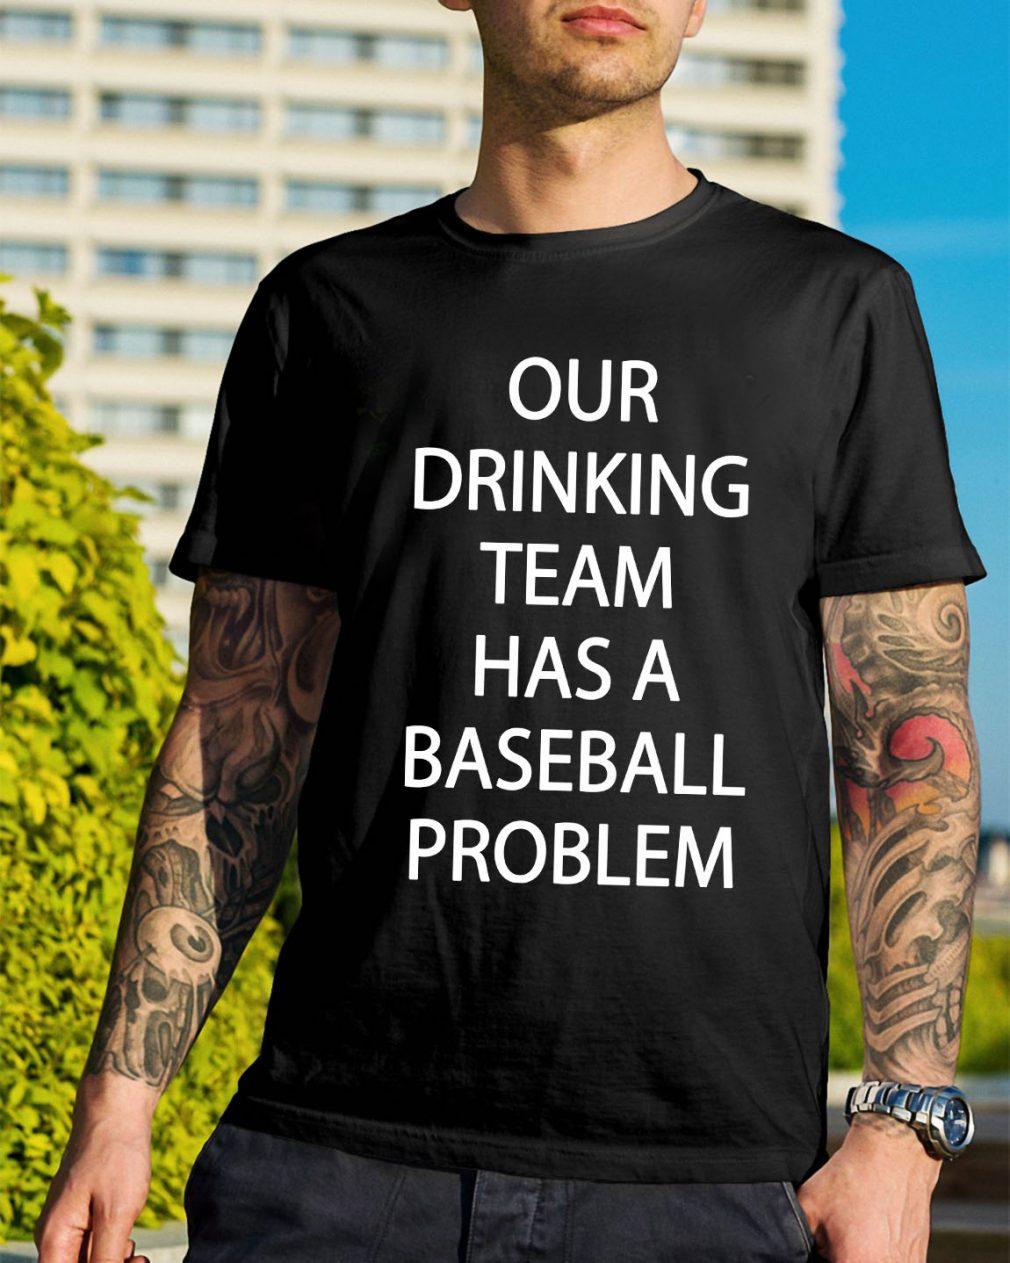 Our drinking team has a baseball problem shirt